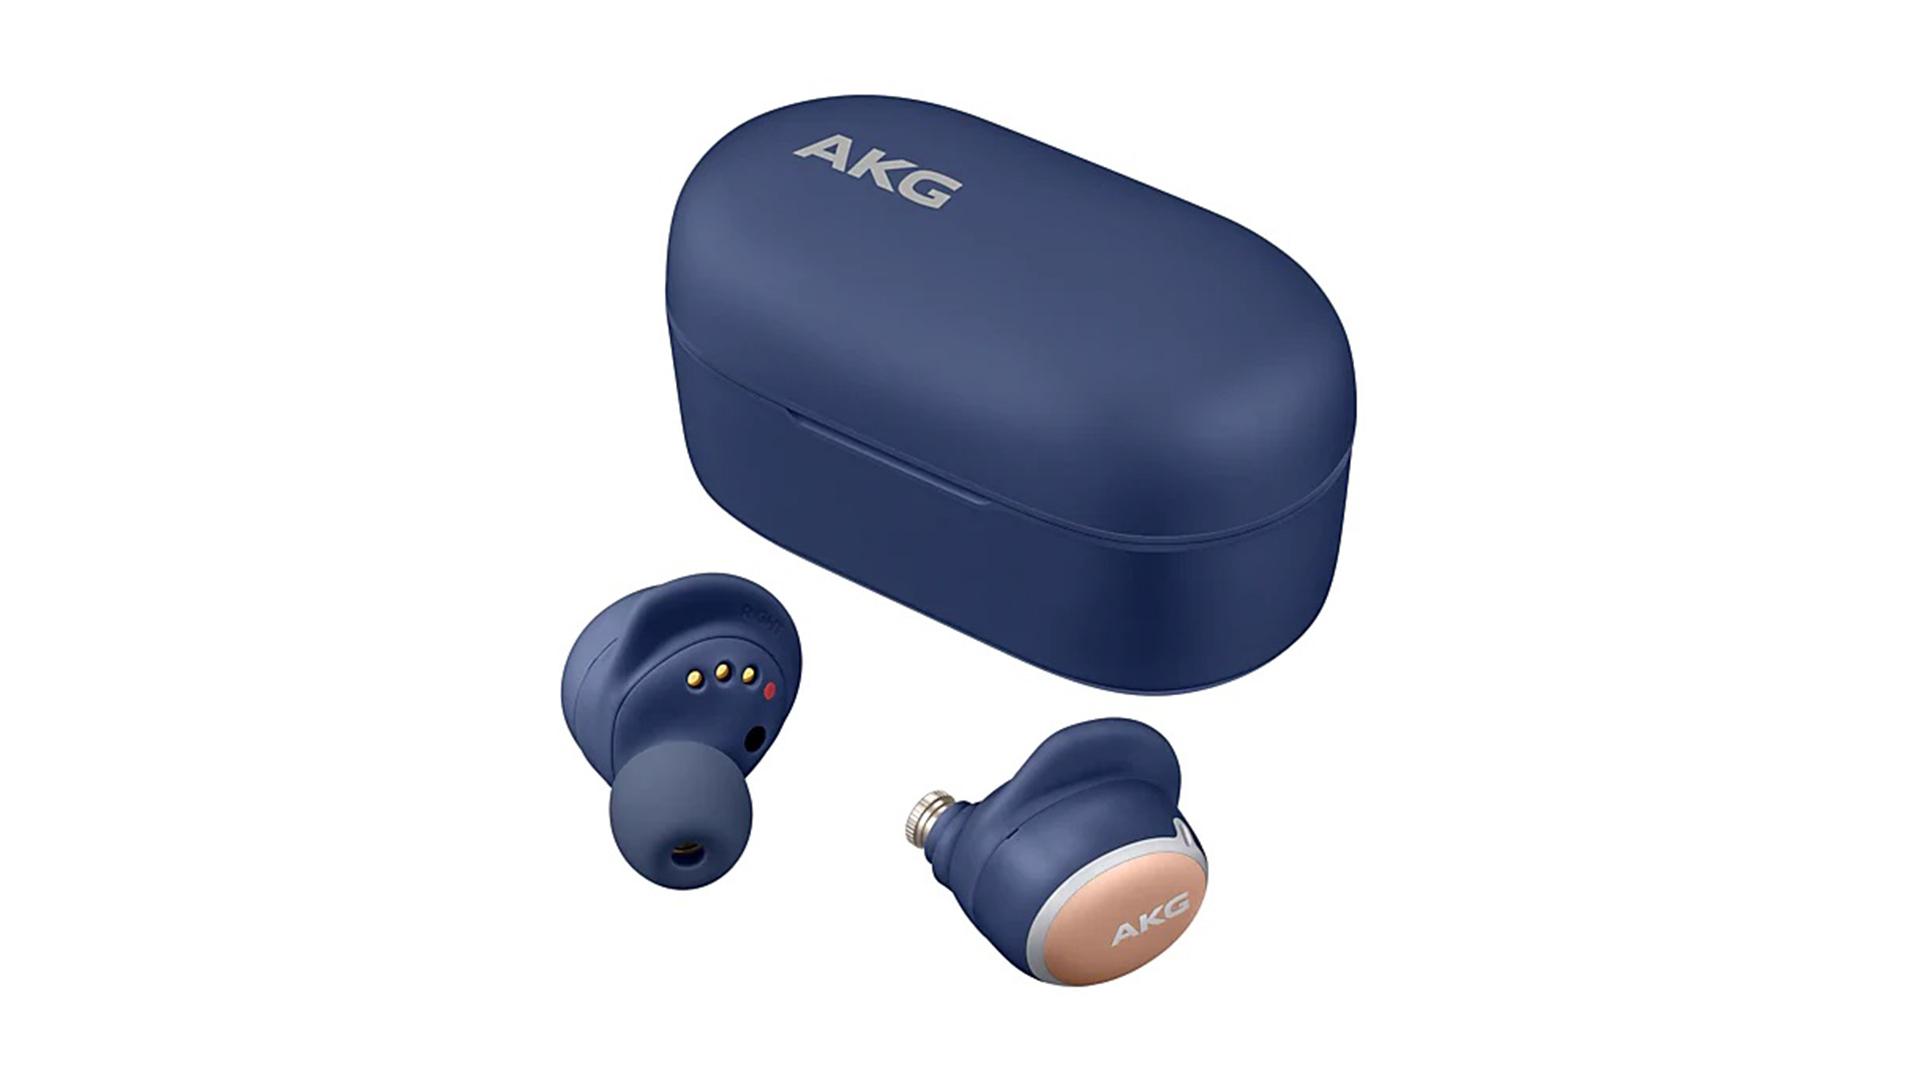 Samsung S Akg N400 Wireless Earphones Feature Anc Water Resistance Sammobile